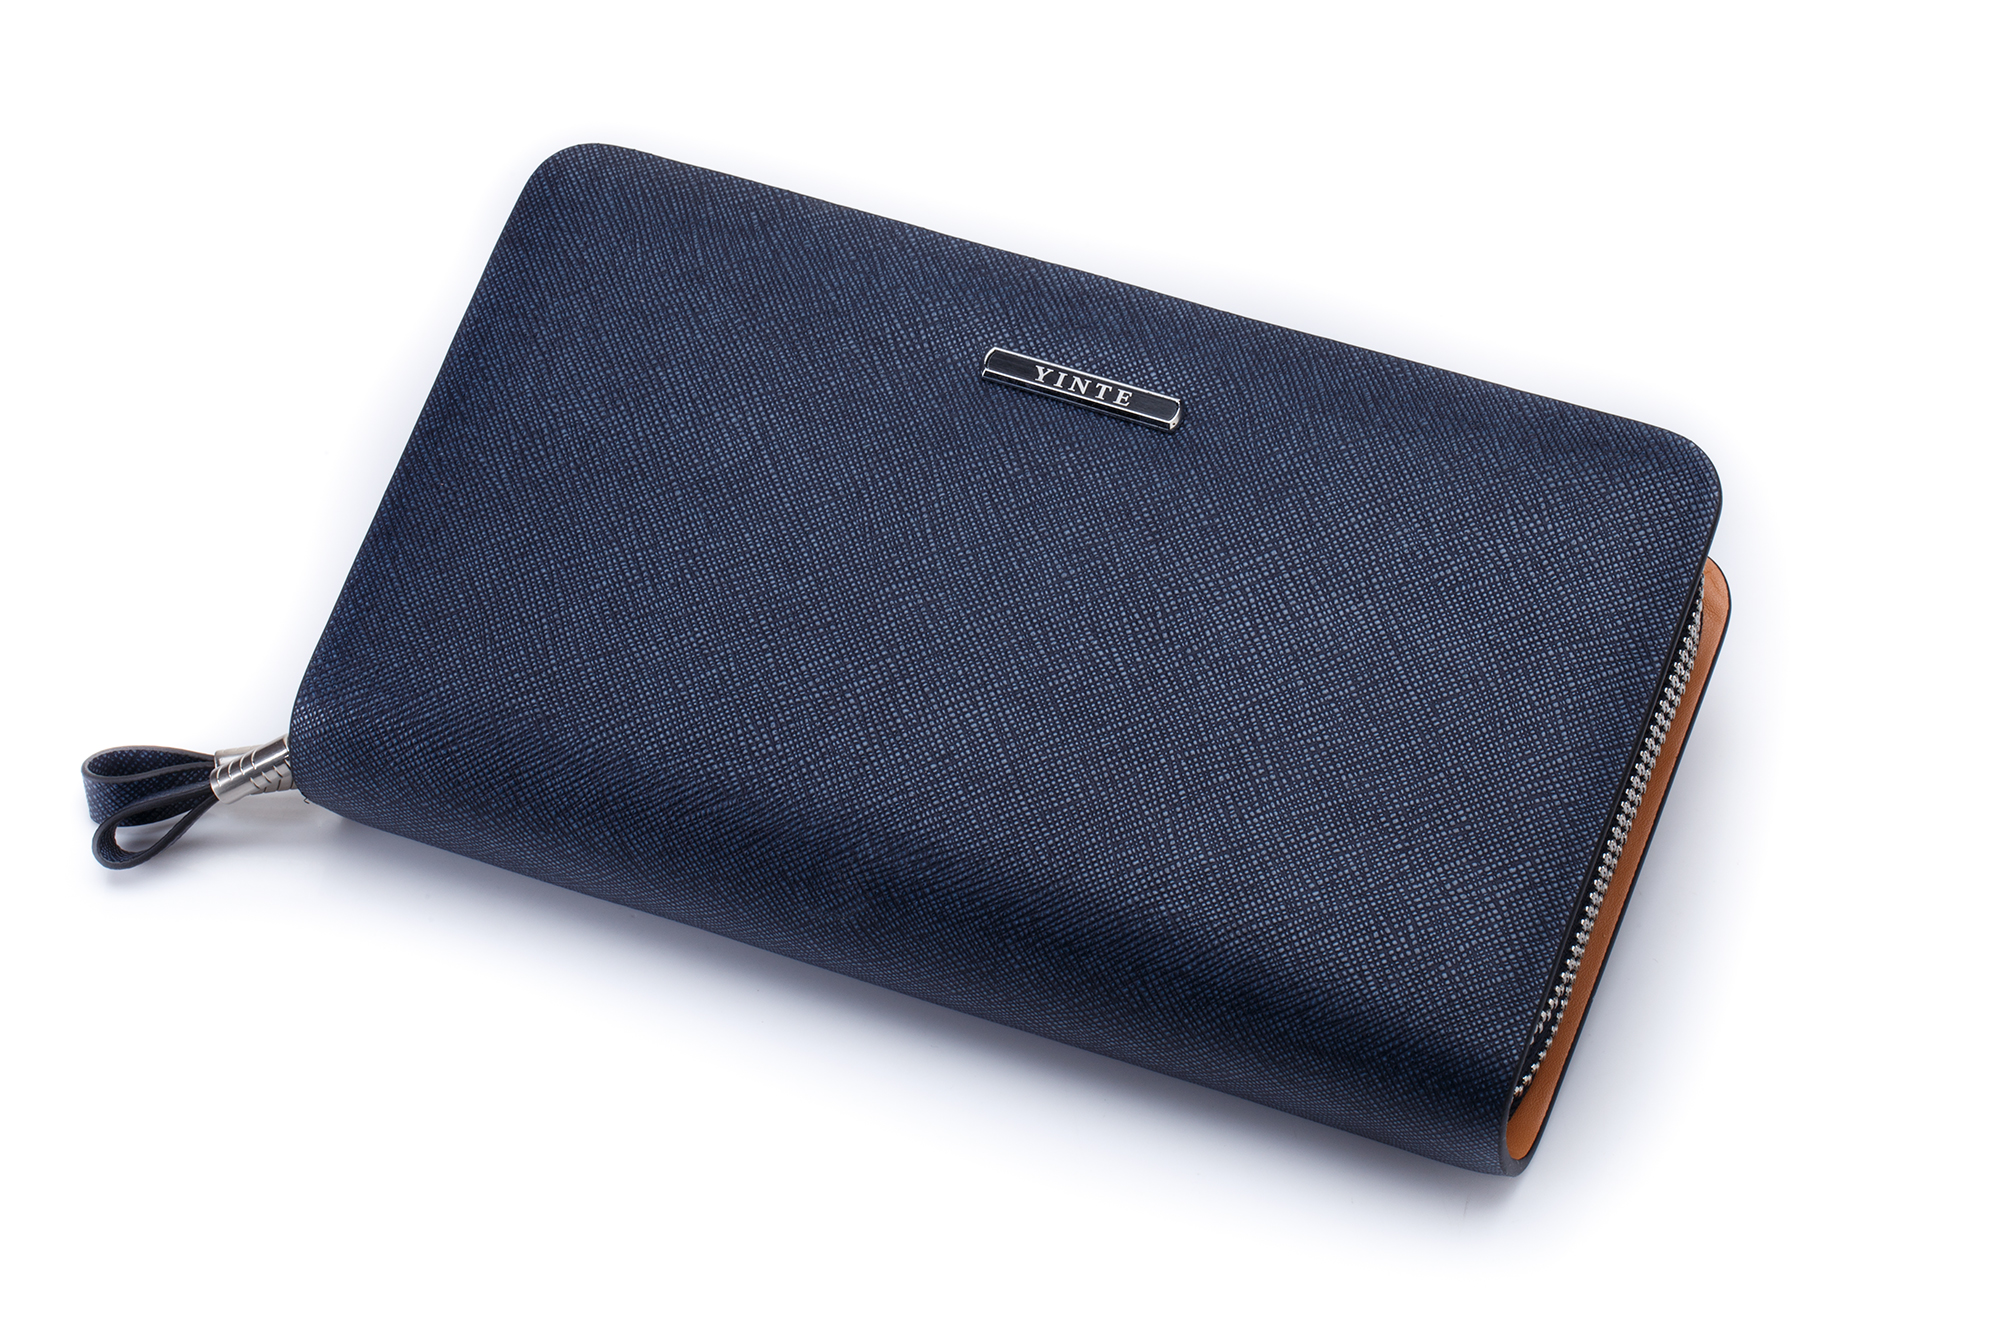 YINTE Mens Clutch Wallets Leather Handbag Organizer Wallet Phone Cash Holder Pocket Blue Color Passport Purse Two Size T029-2